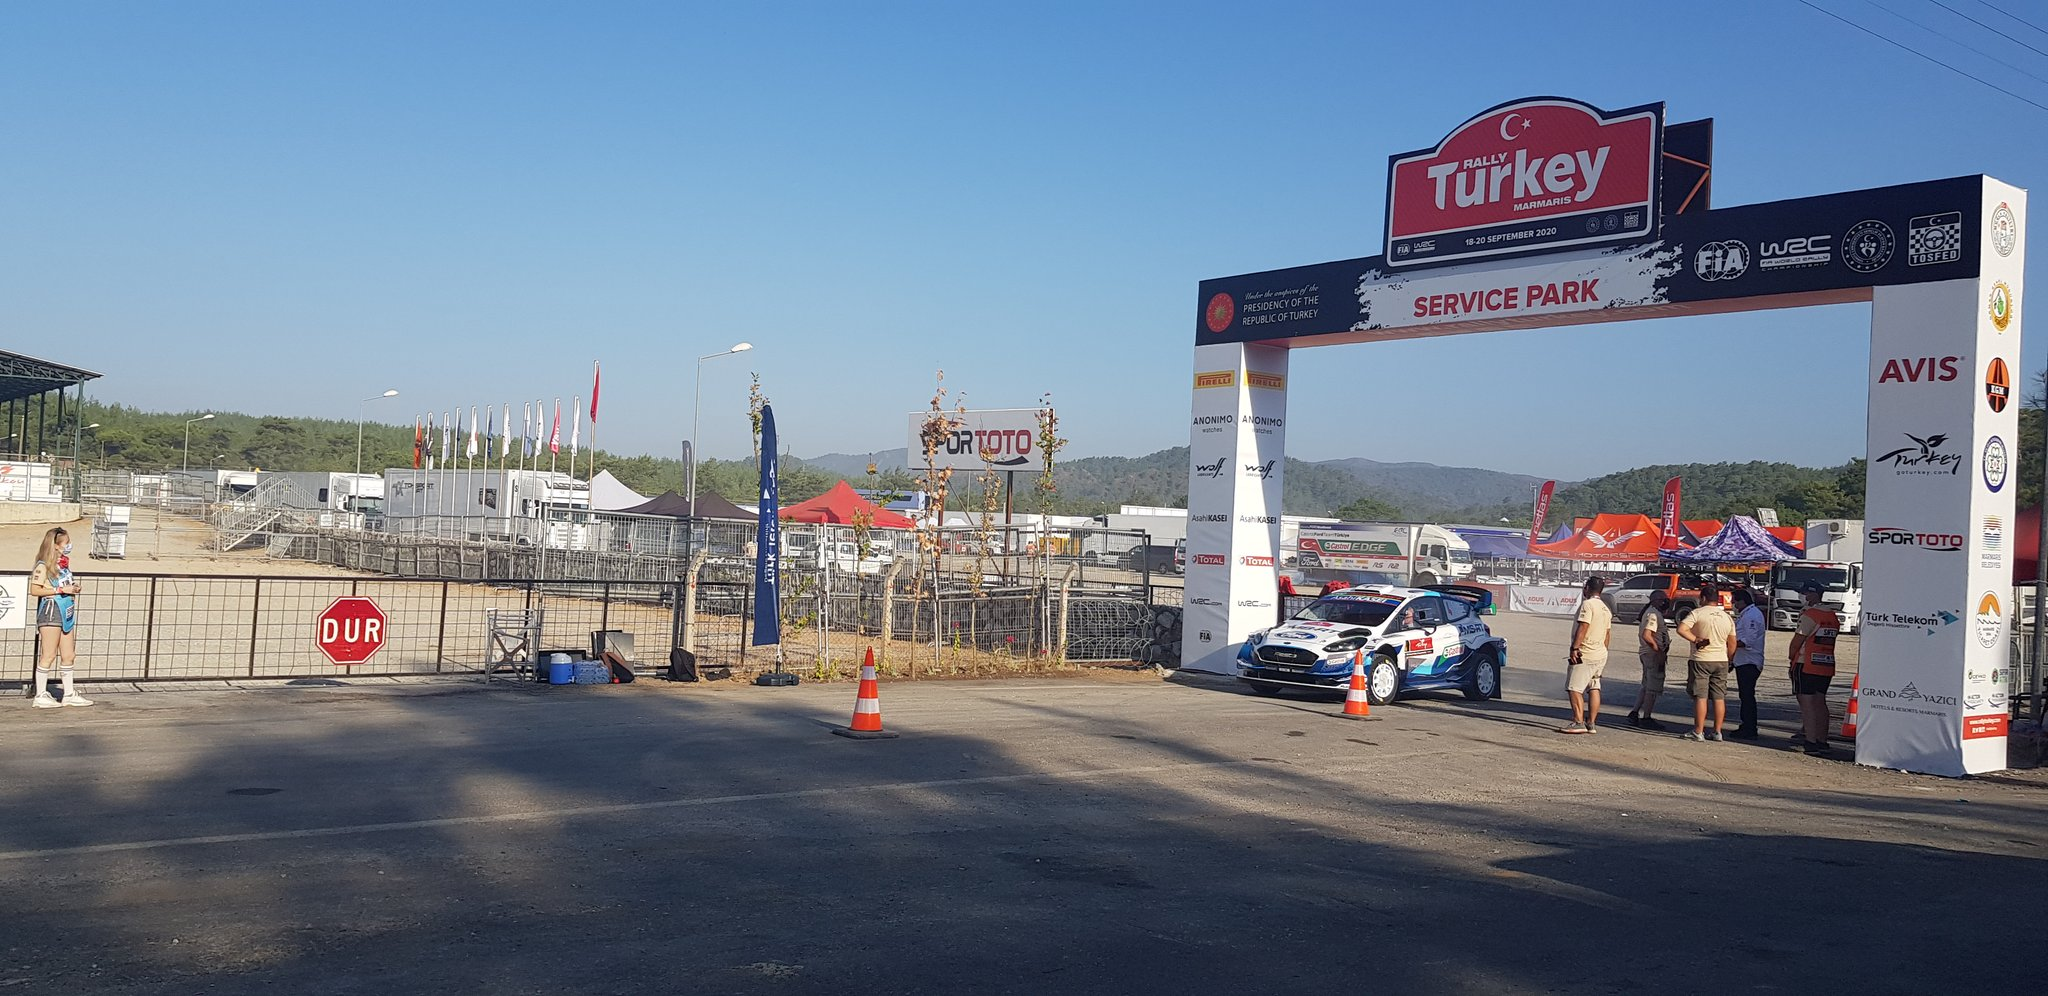 WRC: Marmaris Rally Turkey [18-20 Septiembre] - Página 2 EiLo20wXkAEjmv0?format=jpg&name=large